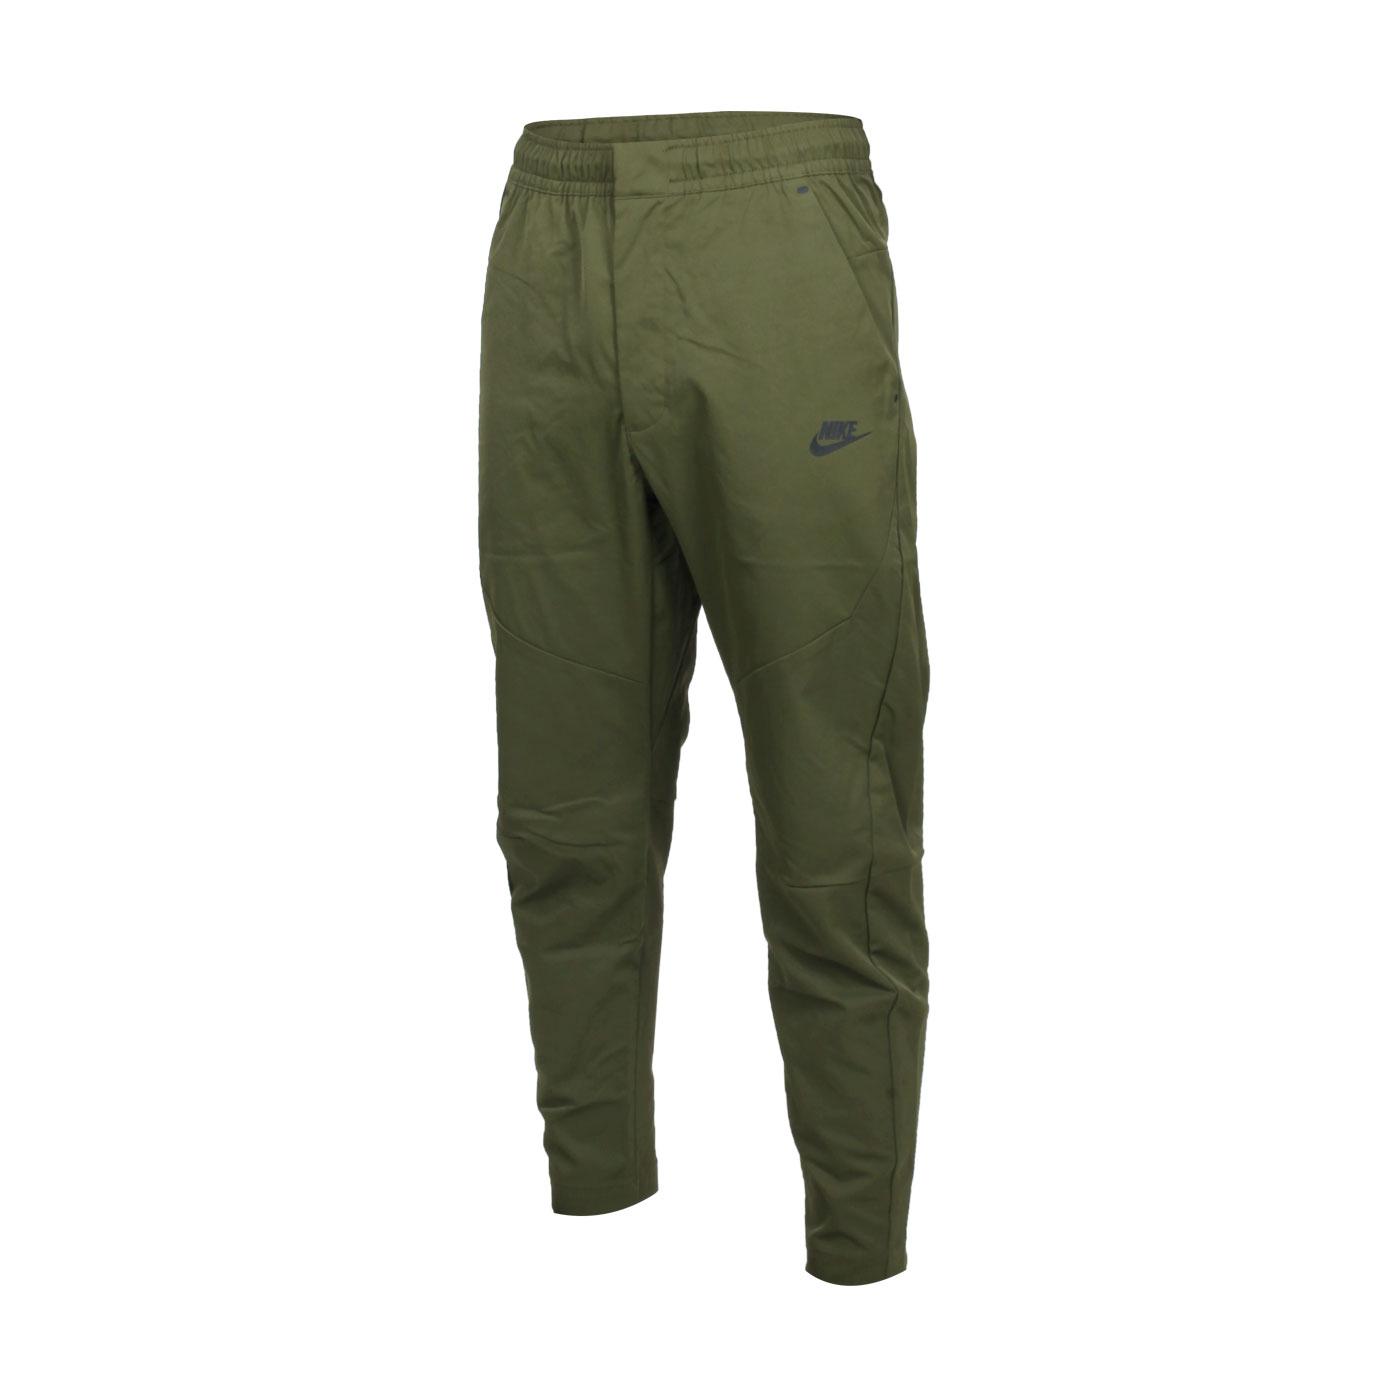 NIKE 男款休閒長褲 DH4225-326 - 軍綠黑